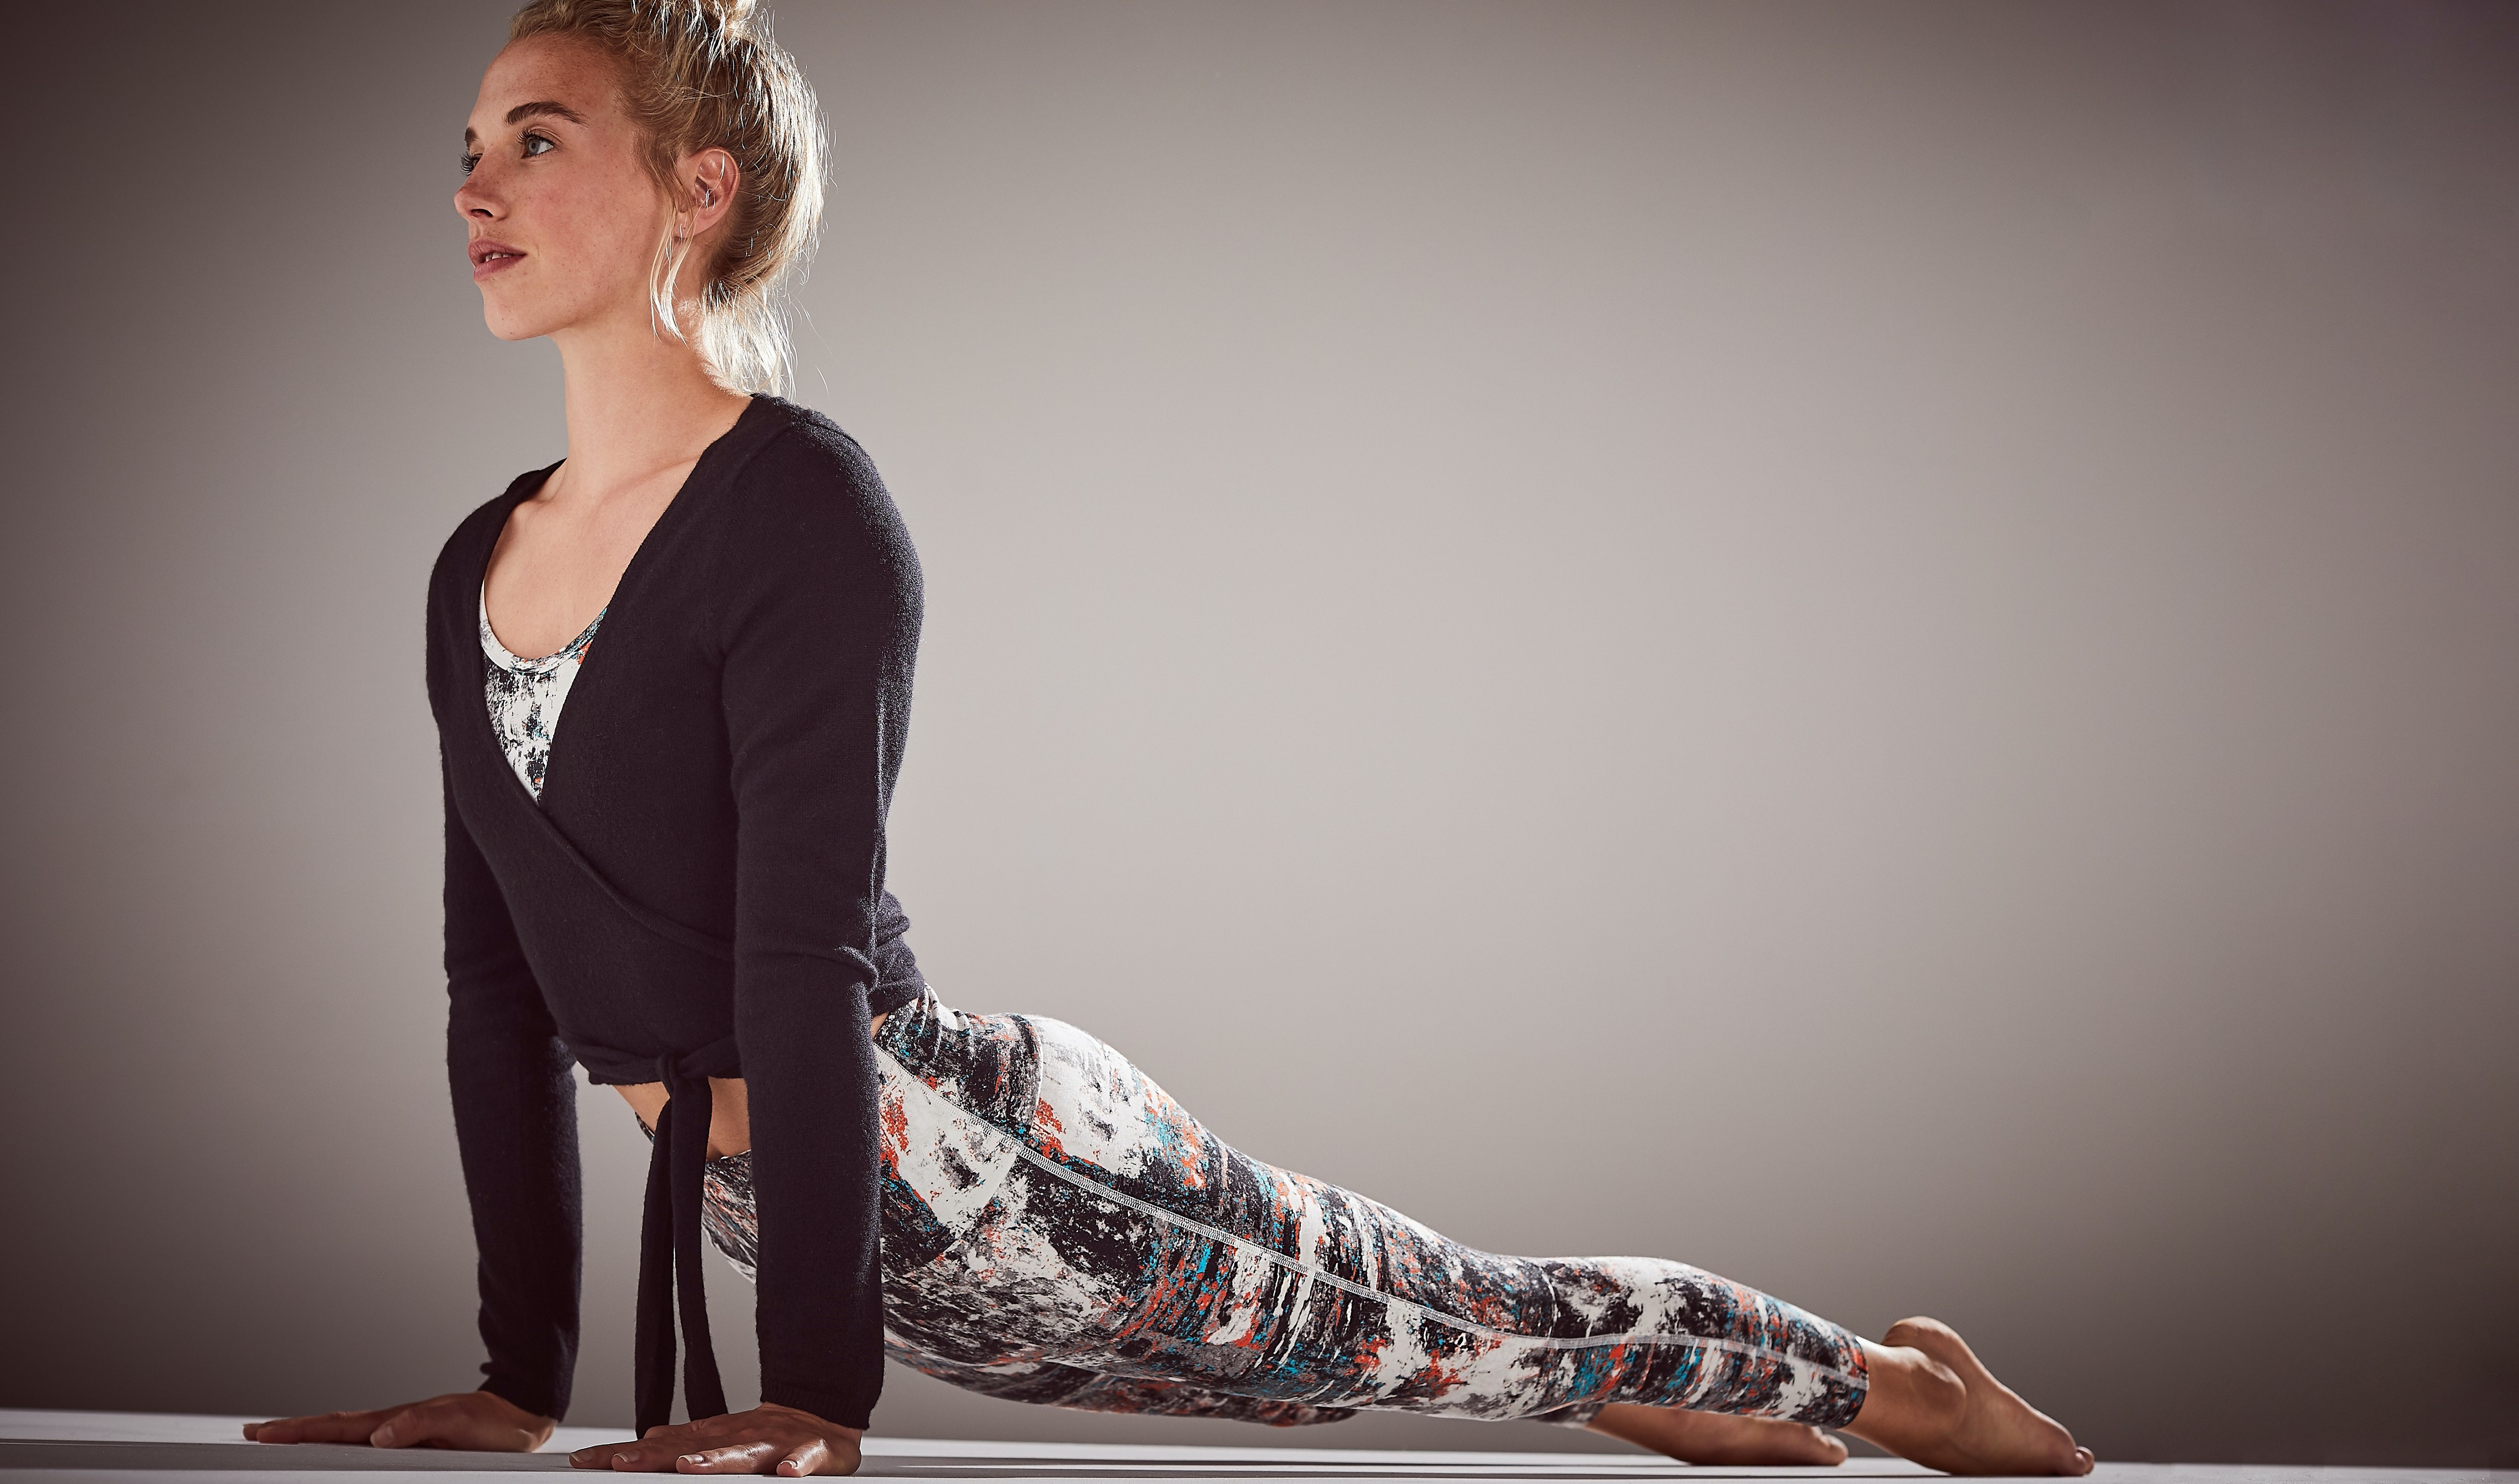 Ballet Wrap £59 worn with Enduro Deep Waistband Leggings £49 from BAM-1